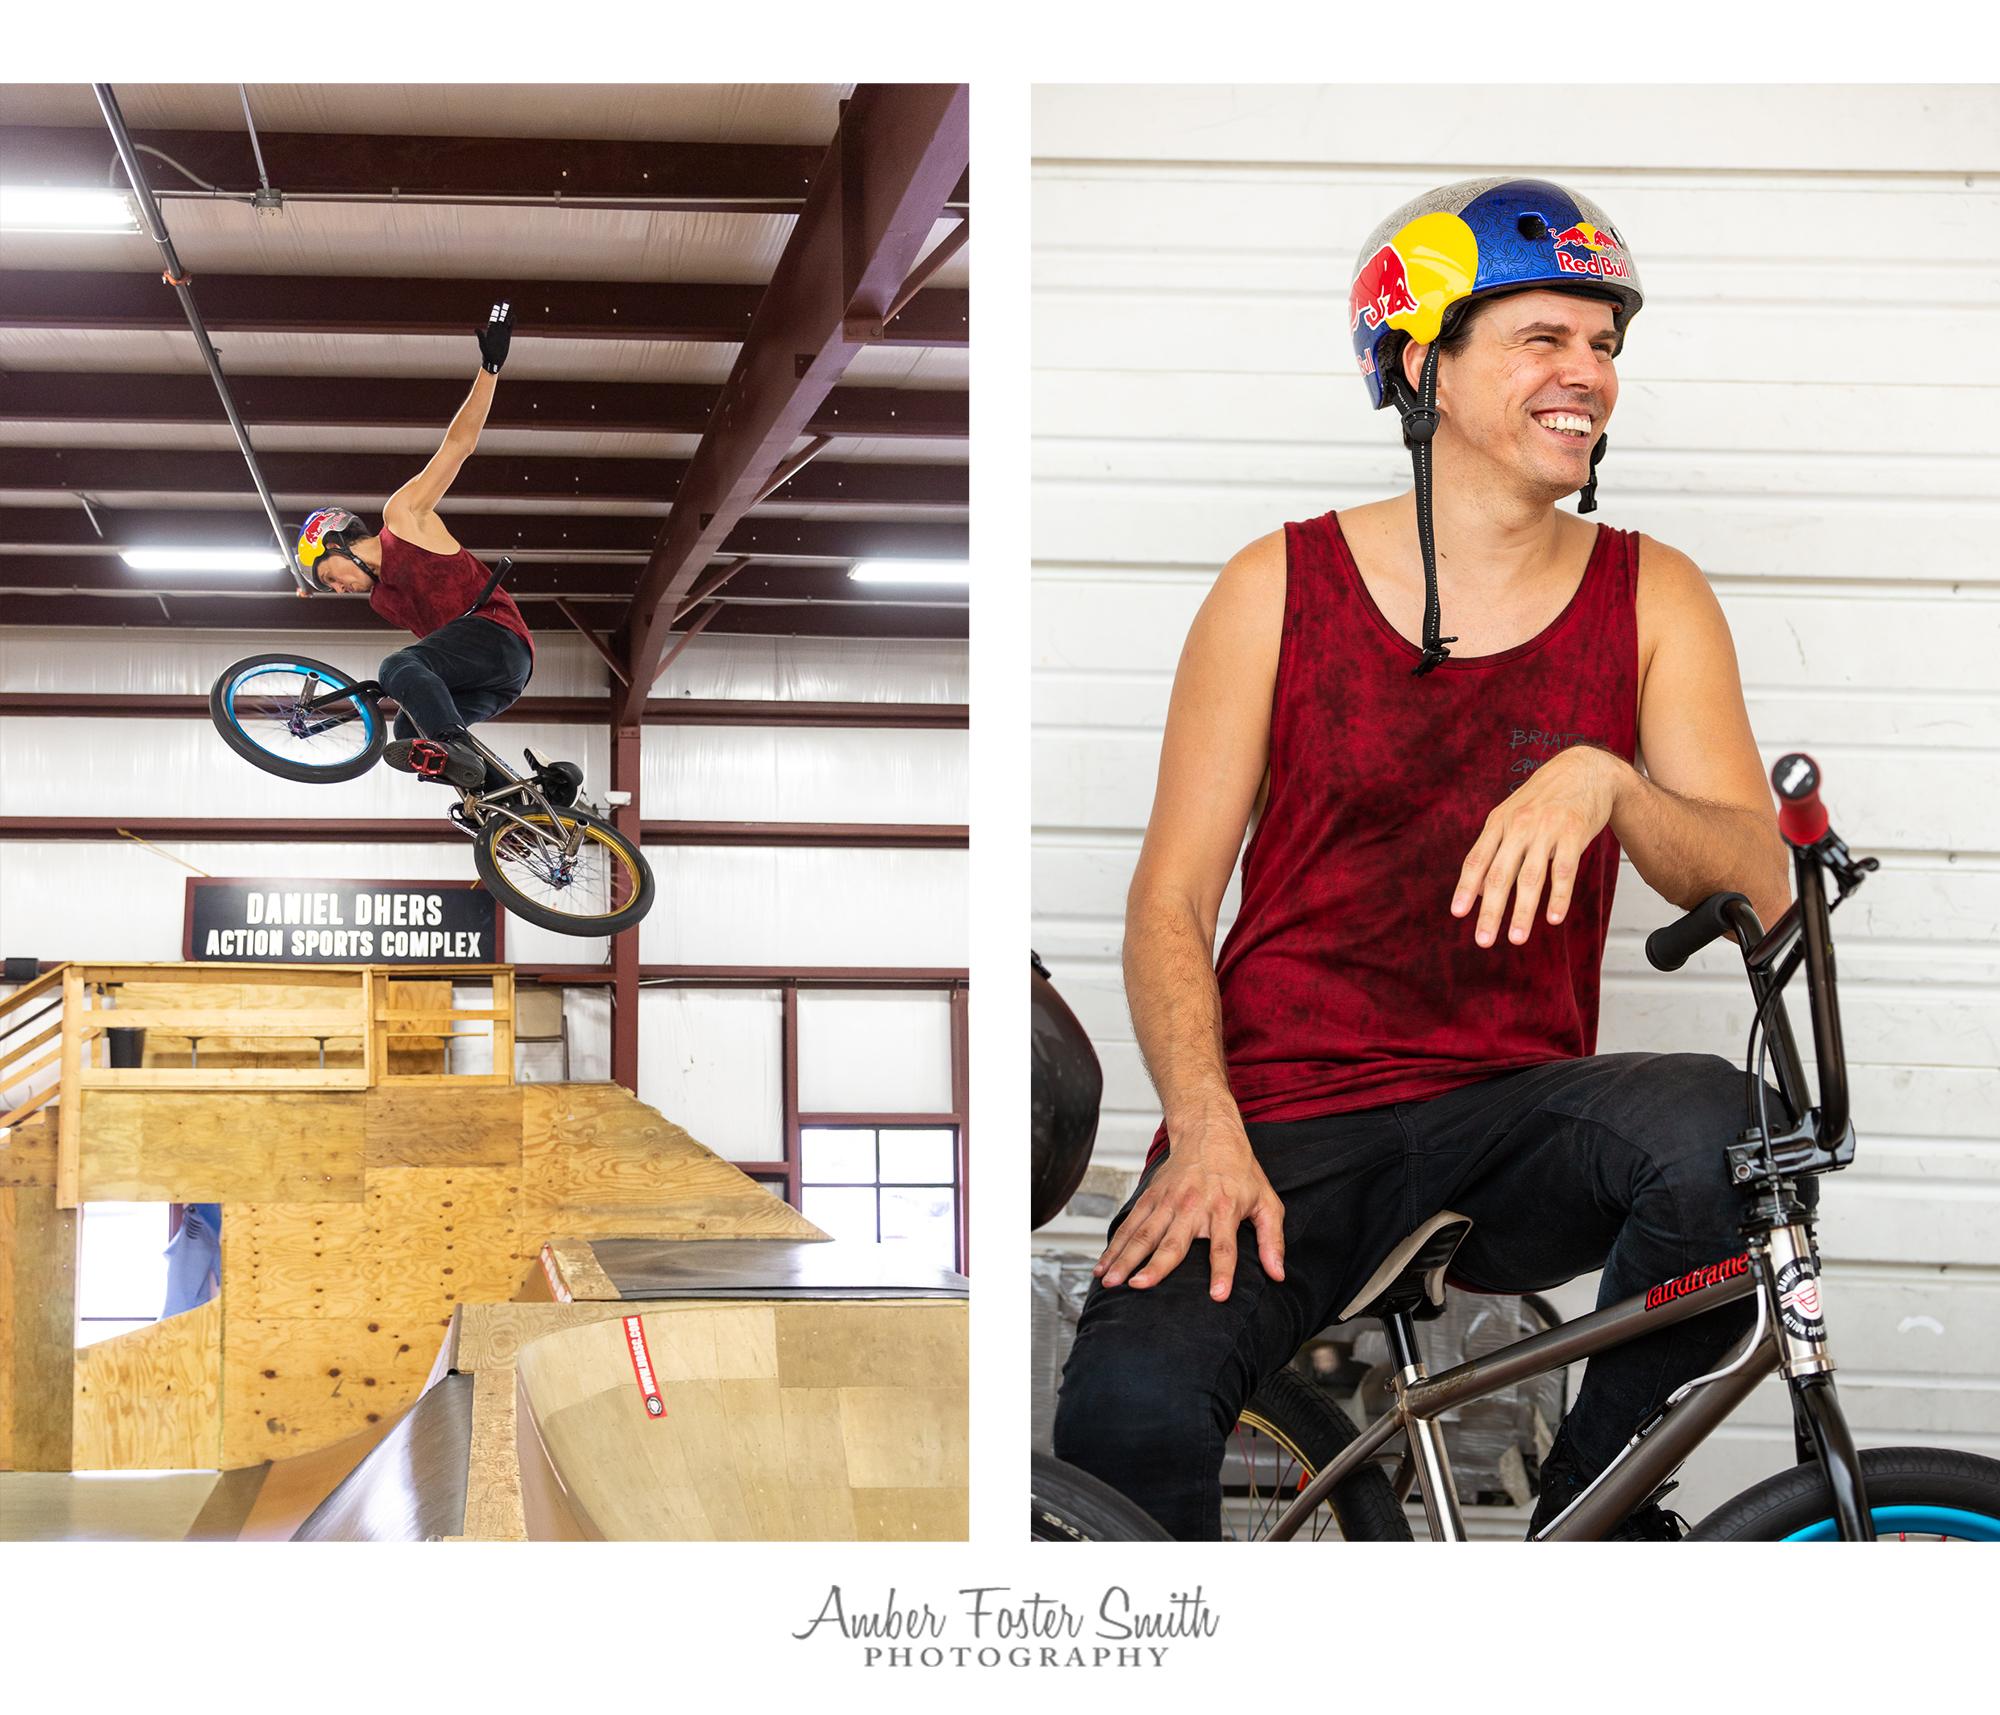 Man on BMX bike doing a trick and sitting on bike